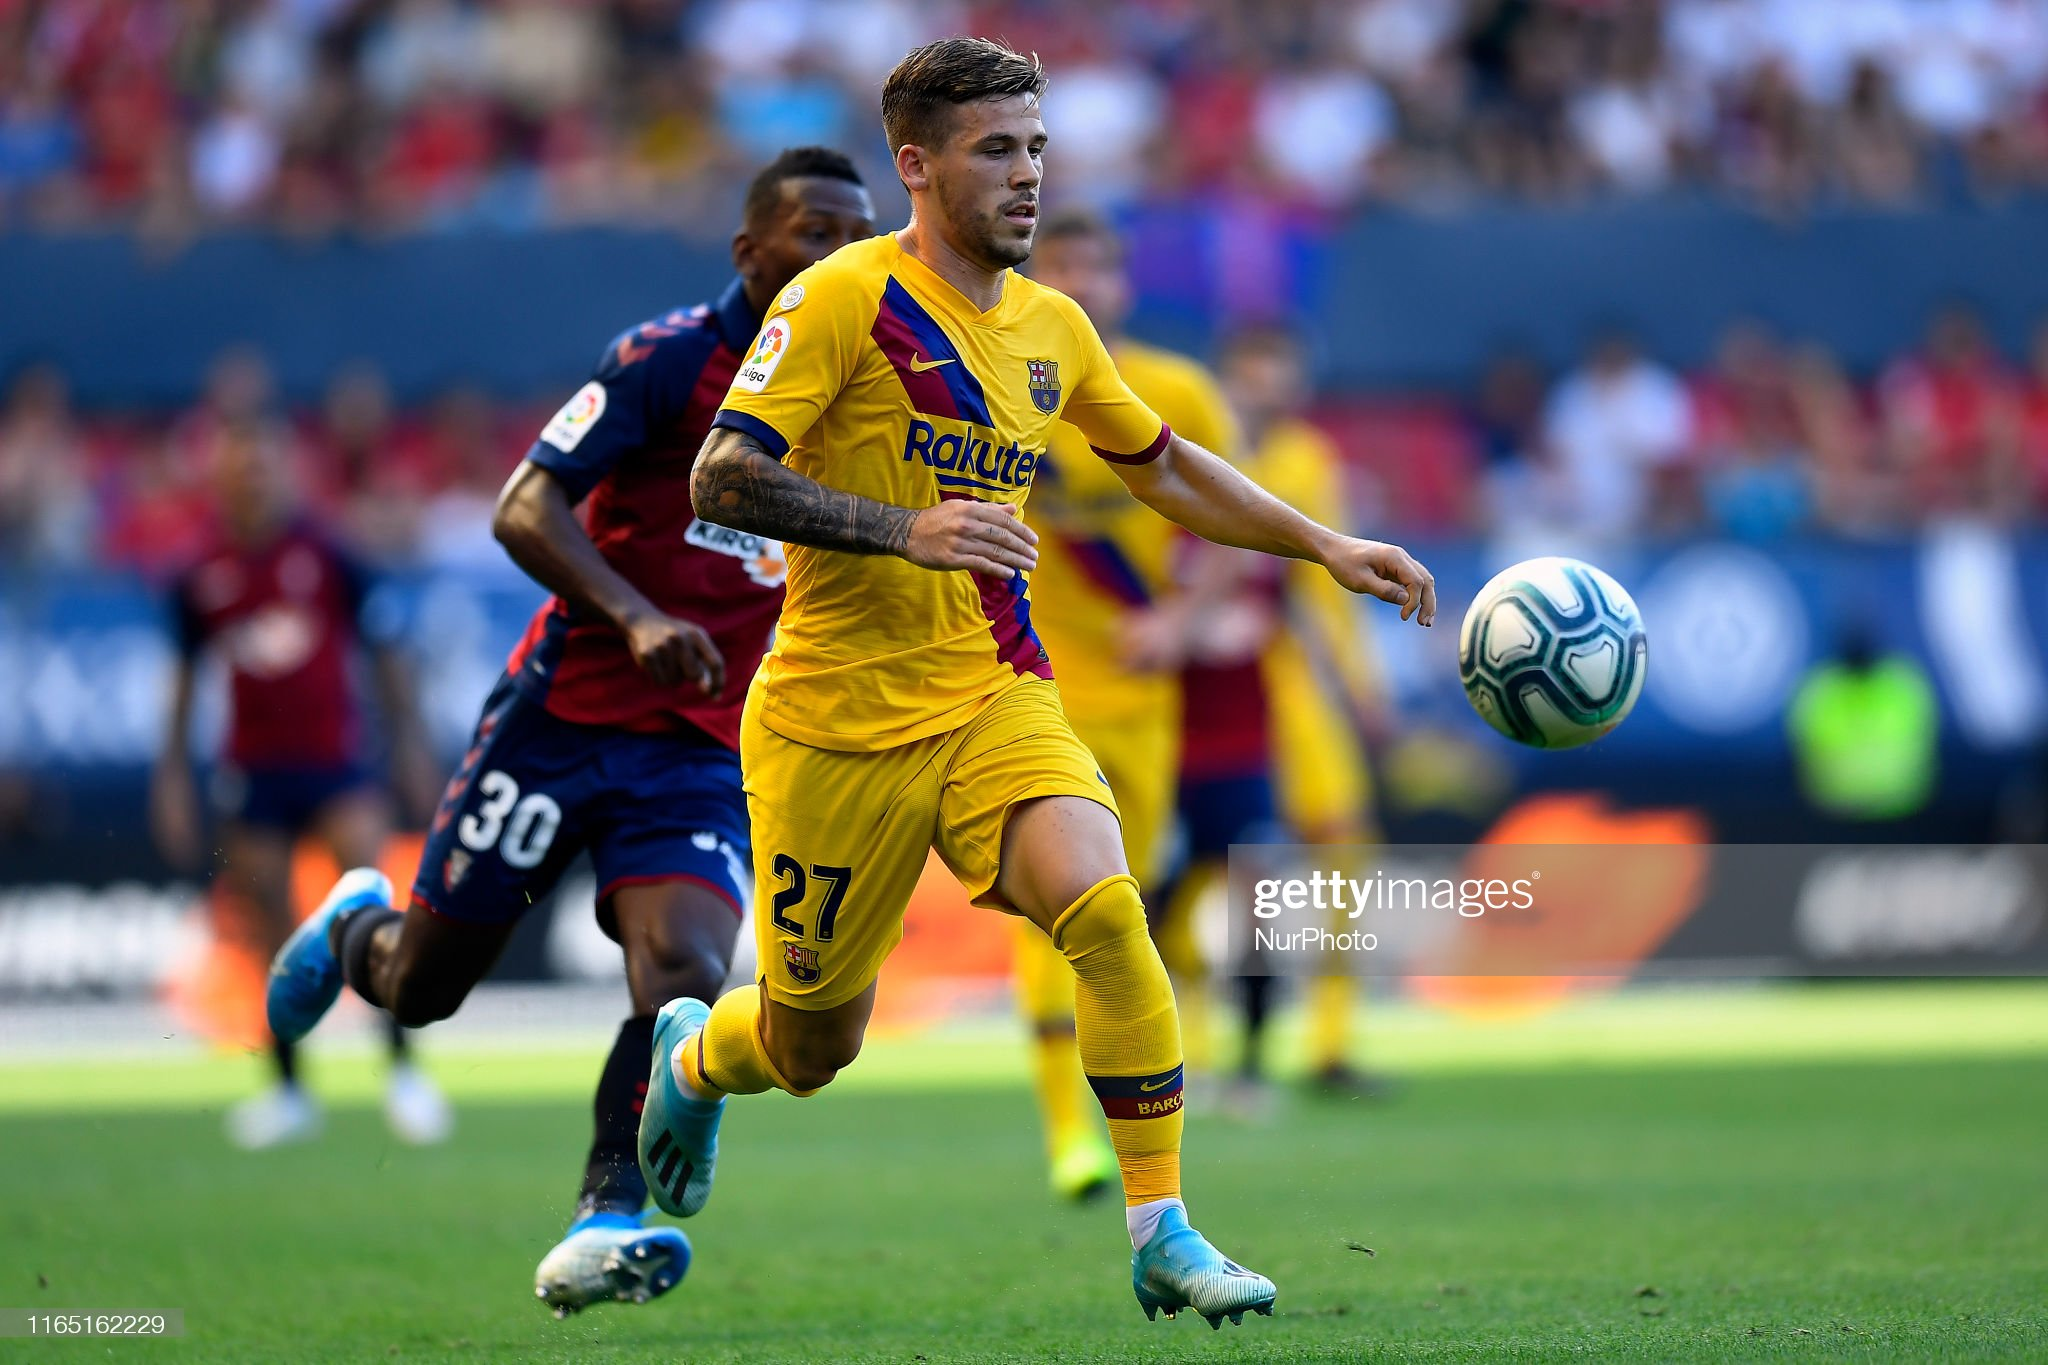 صور مباراة : أوساسونا - برشلونة 2-2 ( 31-08-2019 )  Carles-perez-of-barcelona-controls-the-ball-during-the-liga-match-ca-picture-id1165162229?s=2048x2048